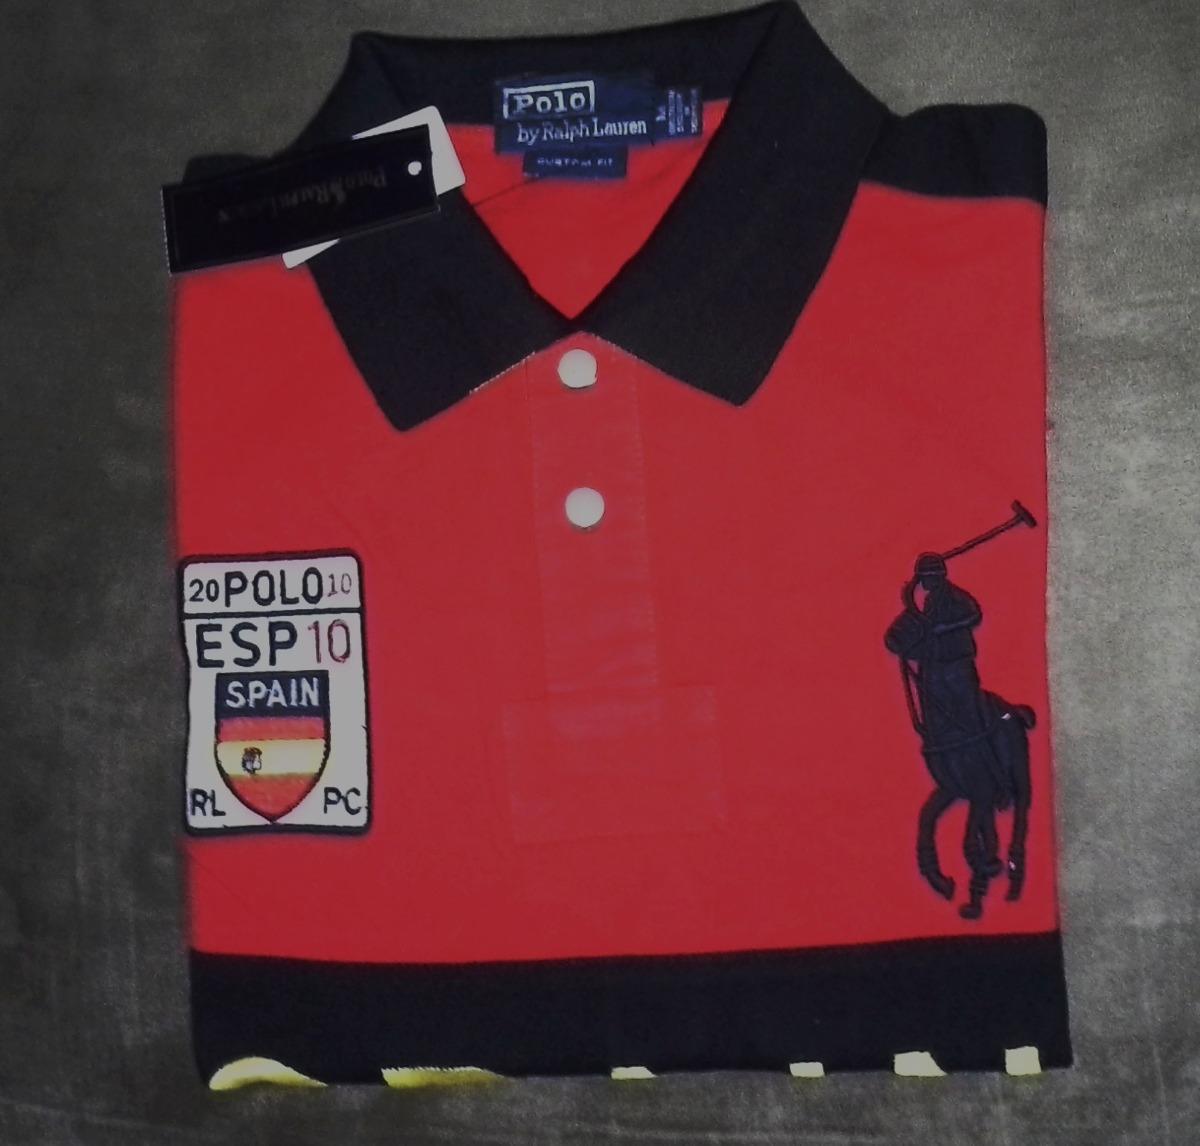 fb7ebcebf3 camisa polo masculina marca famosa vermelha tm m importada. Carregando zoom.